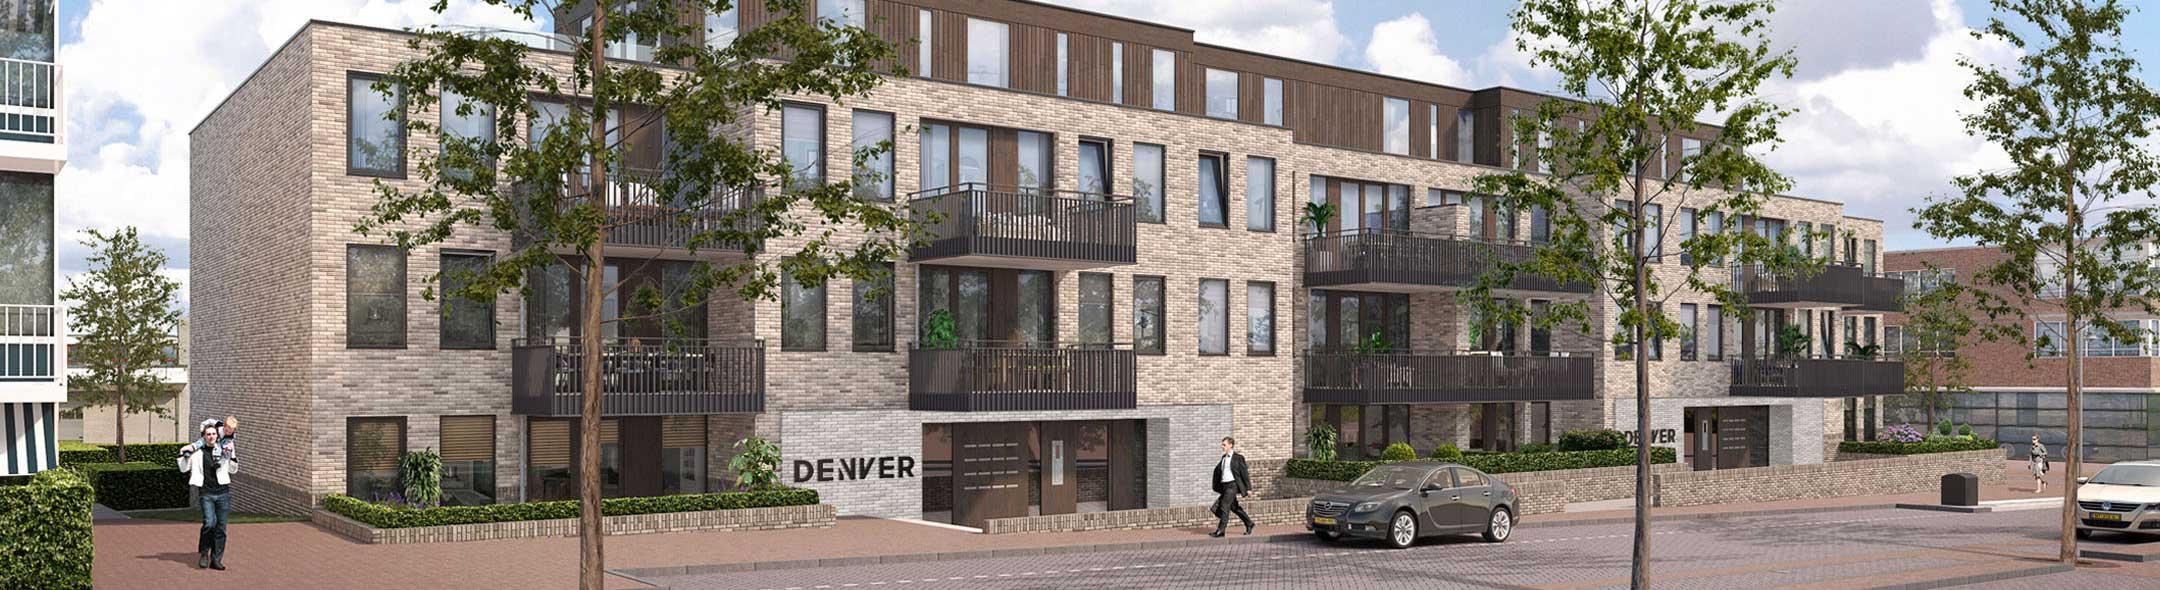 Nieuwbouwproject-Zwanenburg-Denver-Header